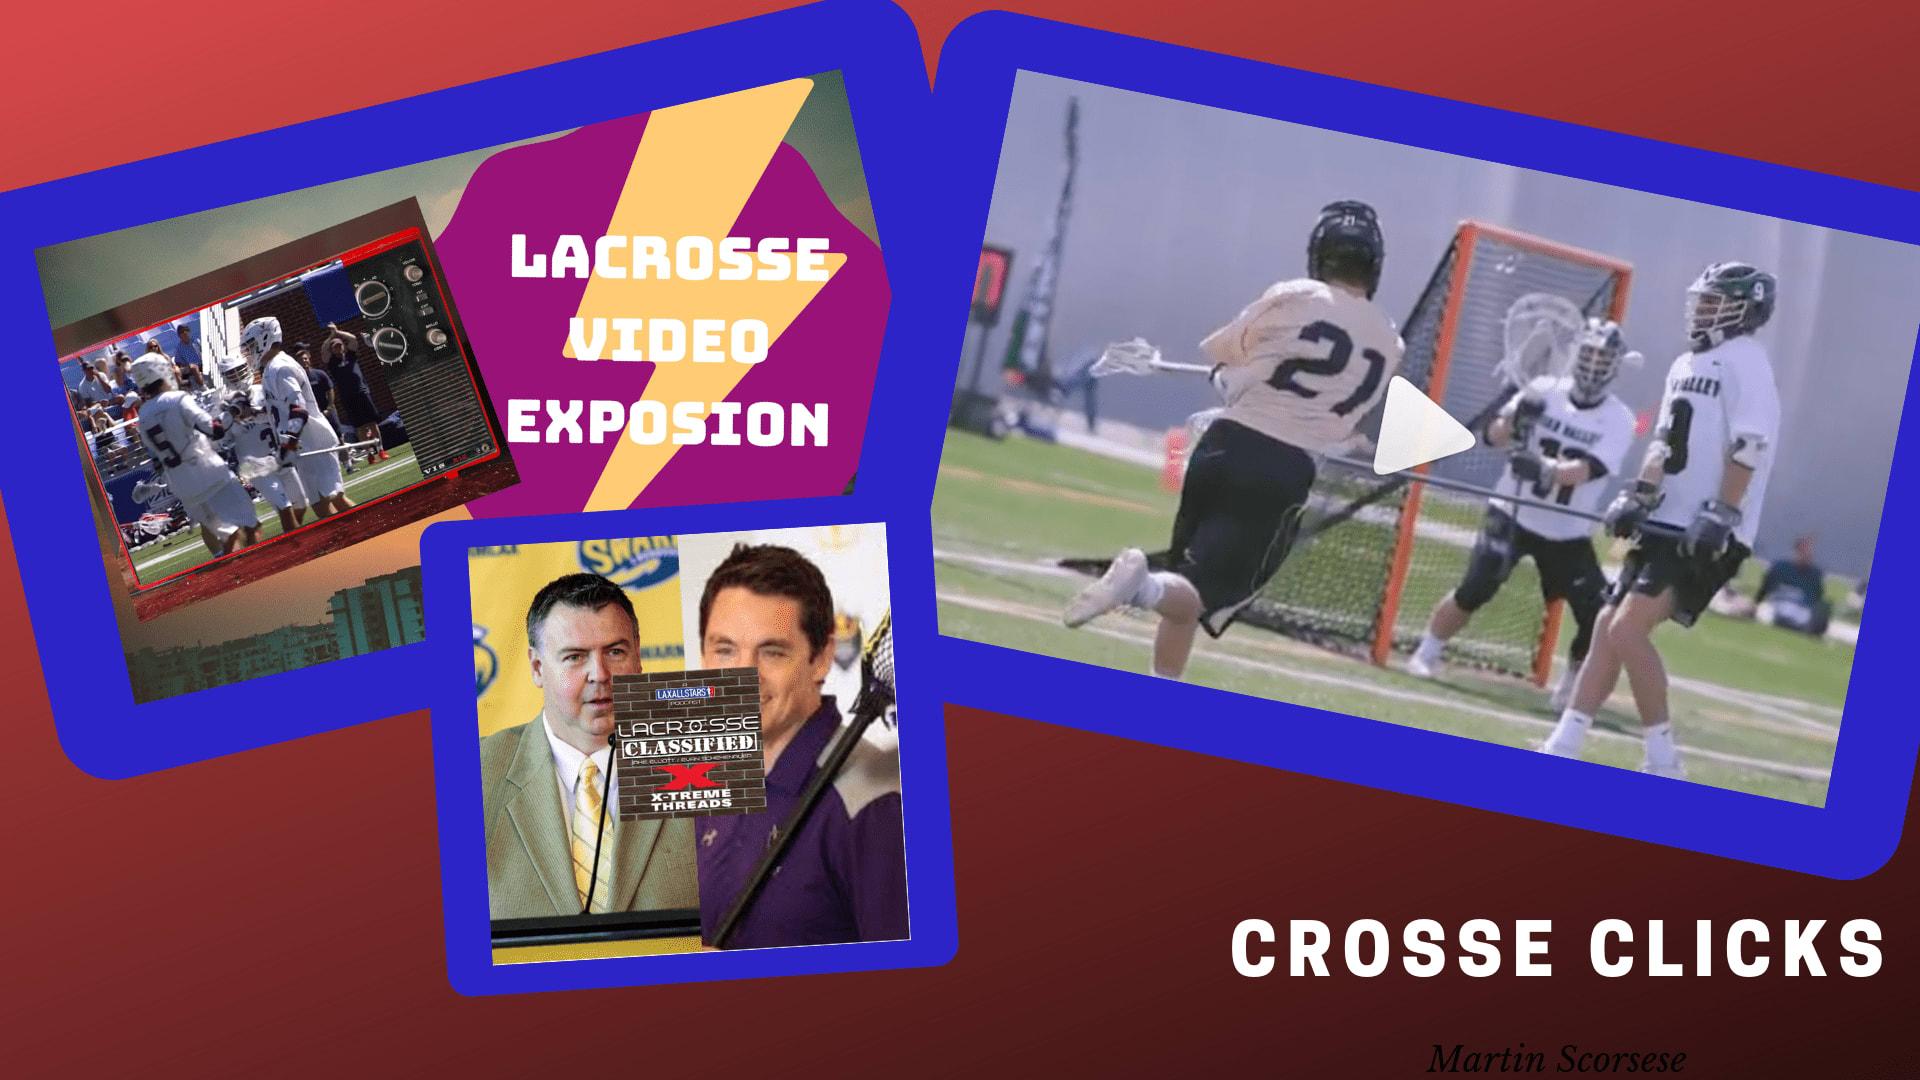 lacrosse highlights lacrosse video explosion ed comeau patrick merrill lacrosse classified crosse clicks